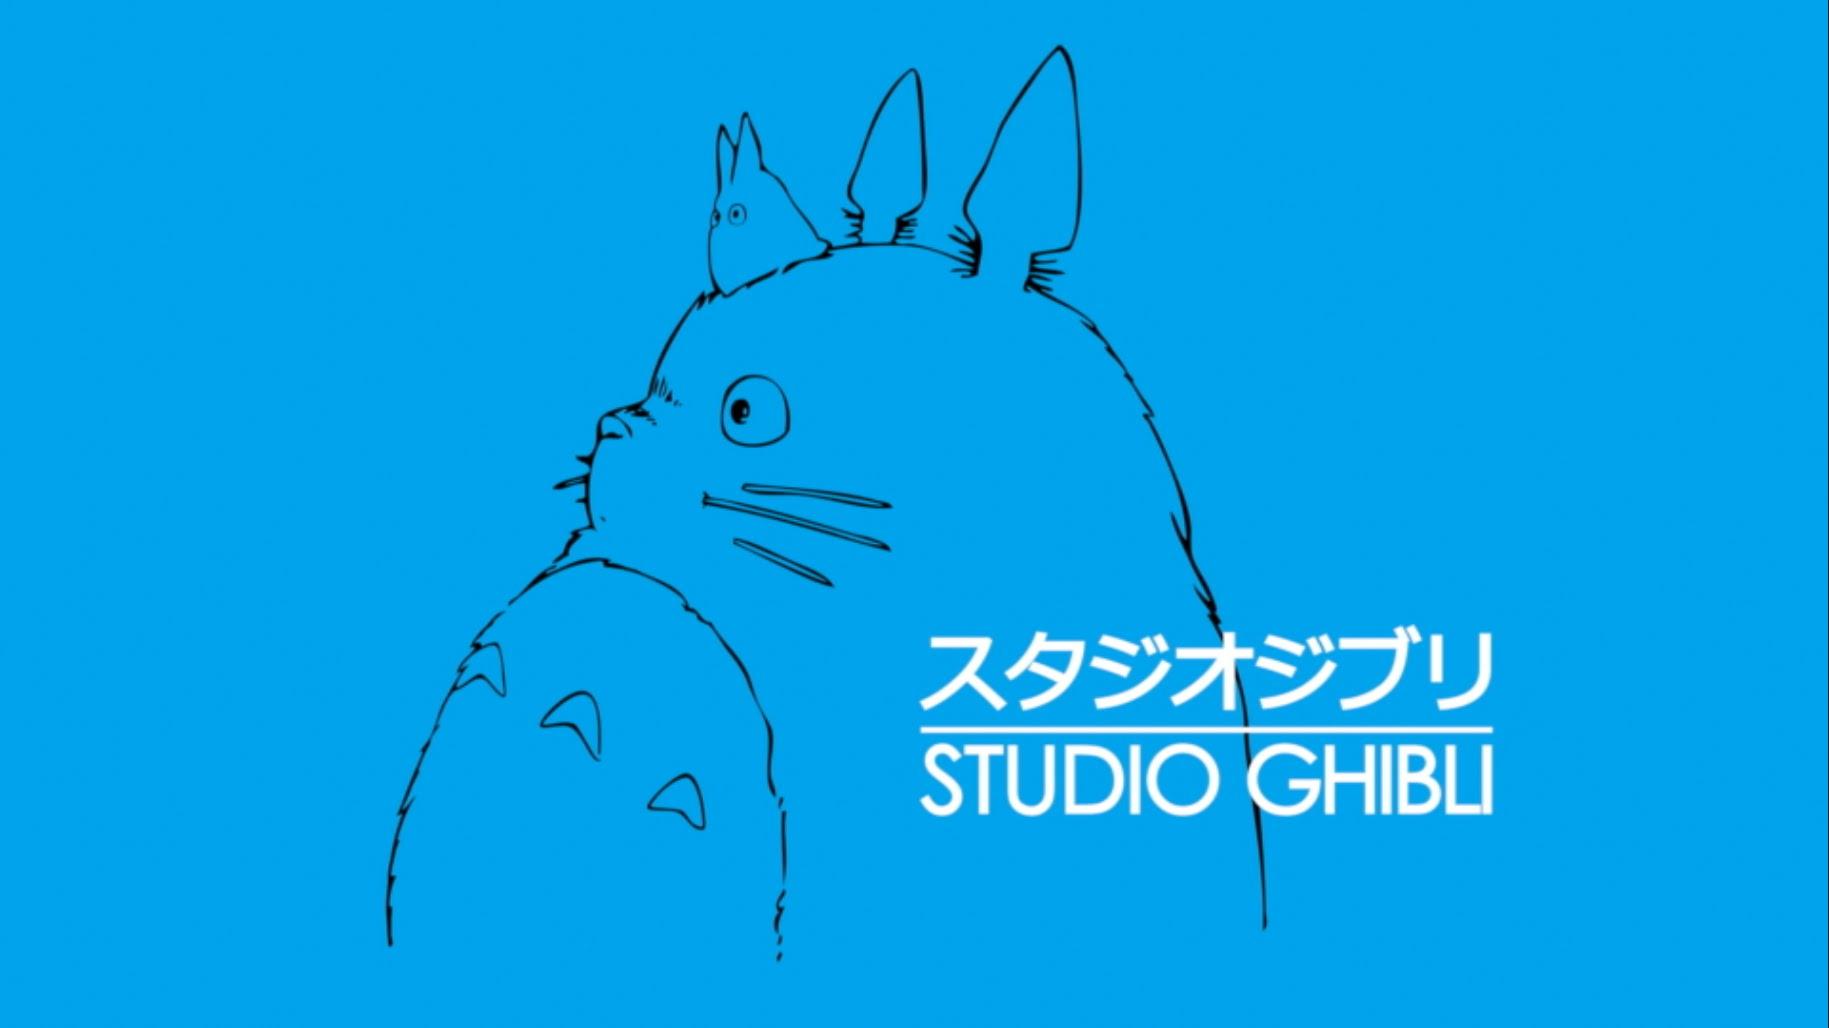 Ghibli : Histoire des studios#1